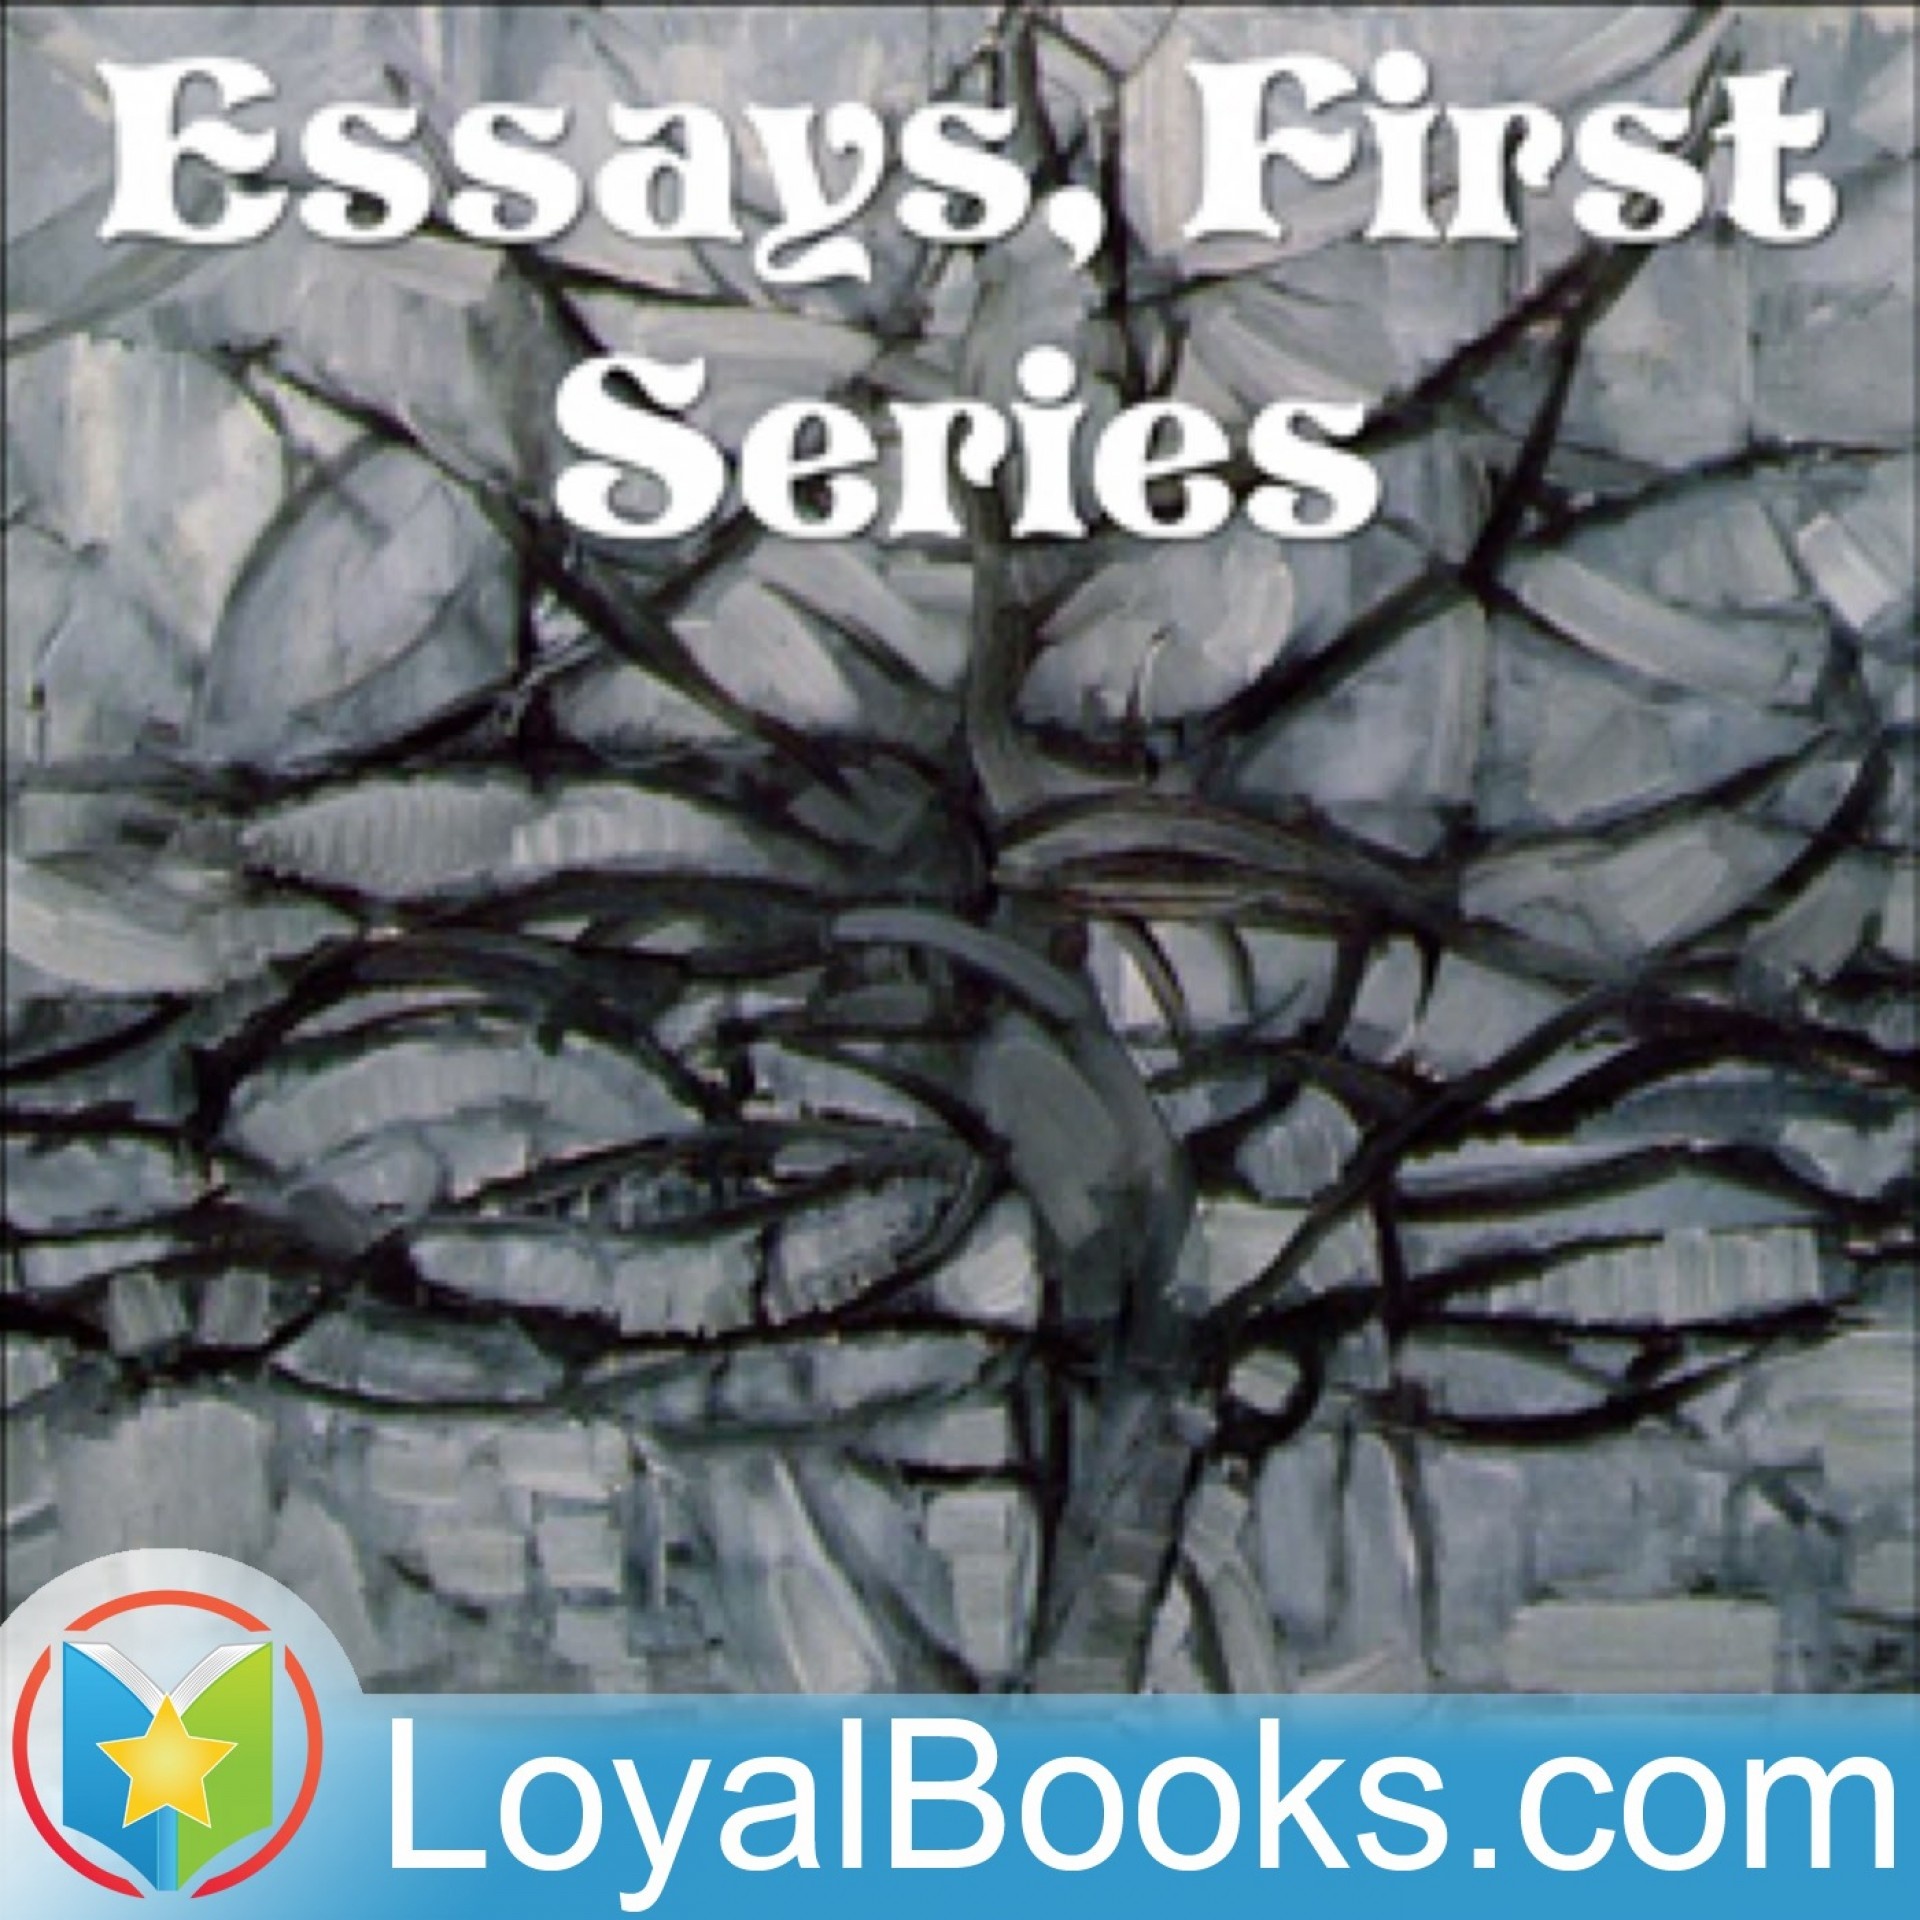 015 Essay Example Essays First Series By Ralph Waldo Stunning Emerson Pdf Shelburne Publisher 1920